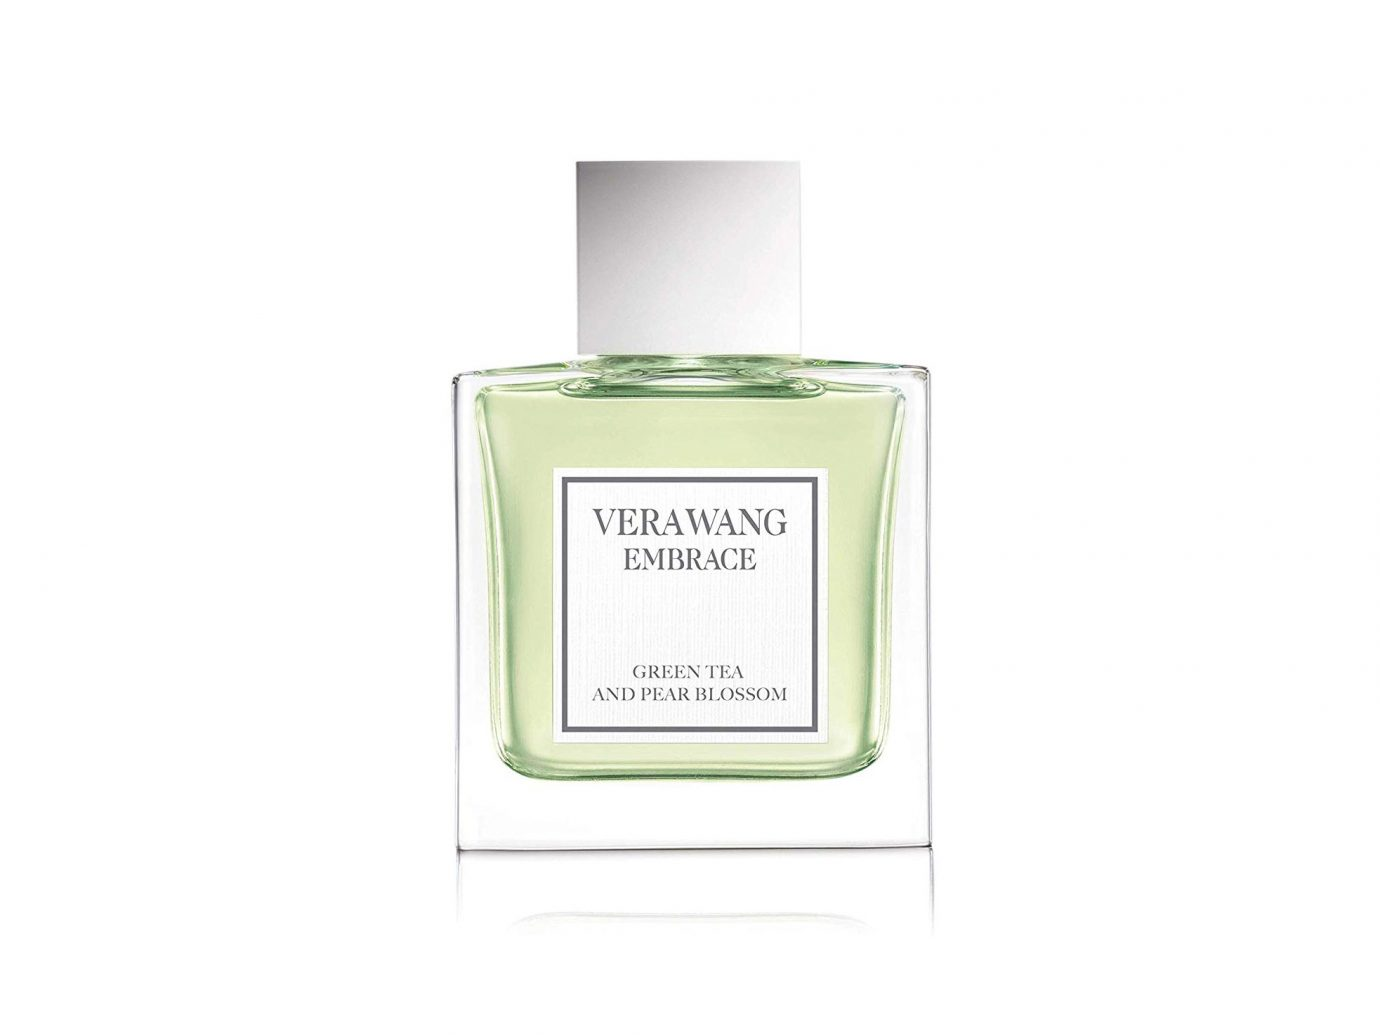 Vera Wang Embrace Eau de Toilette Spray for Women, Green Tea & Pear Blossom